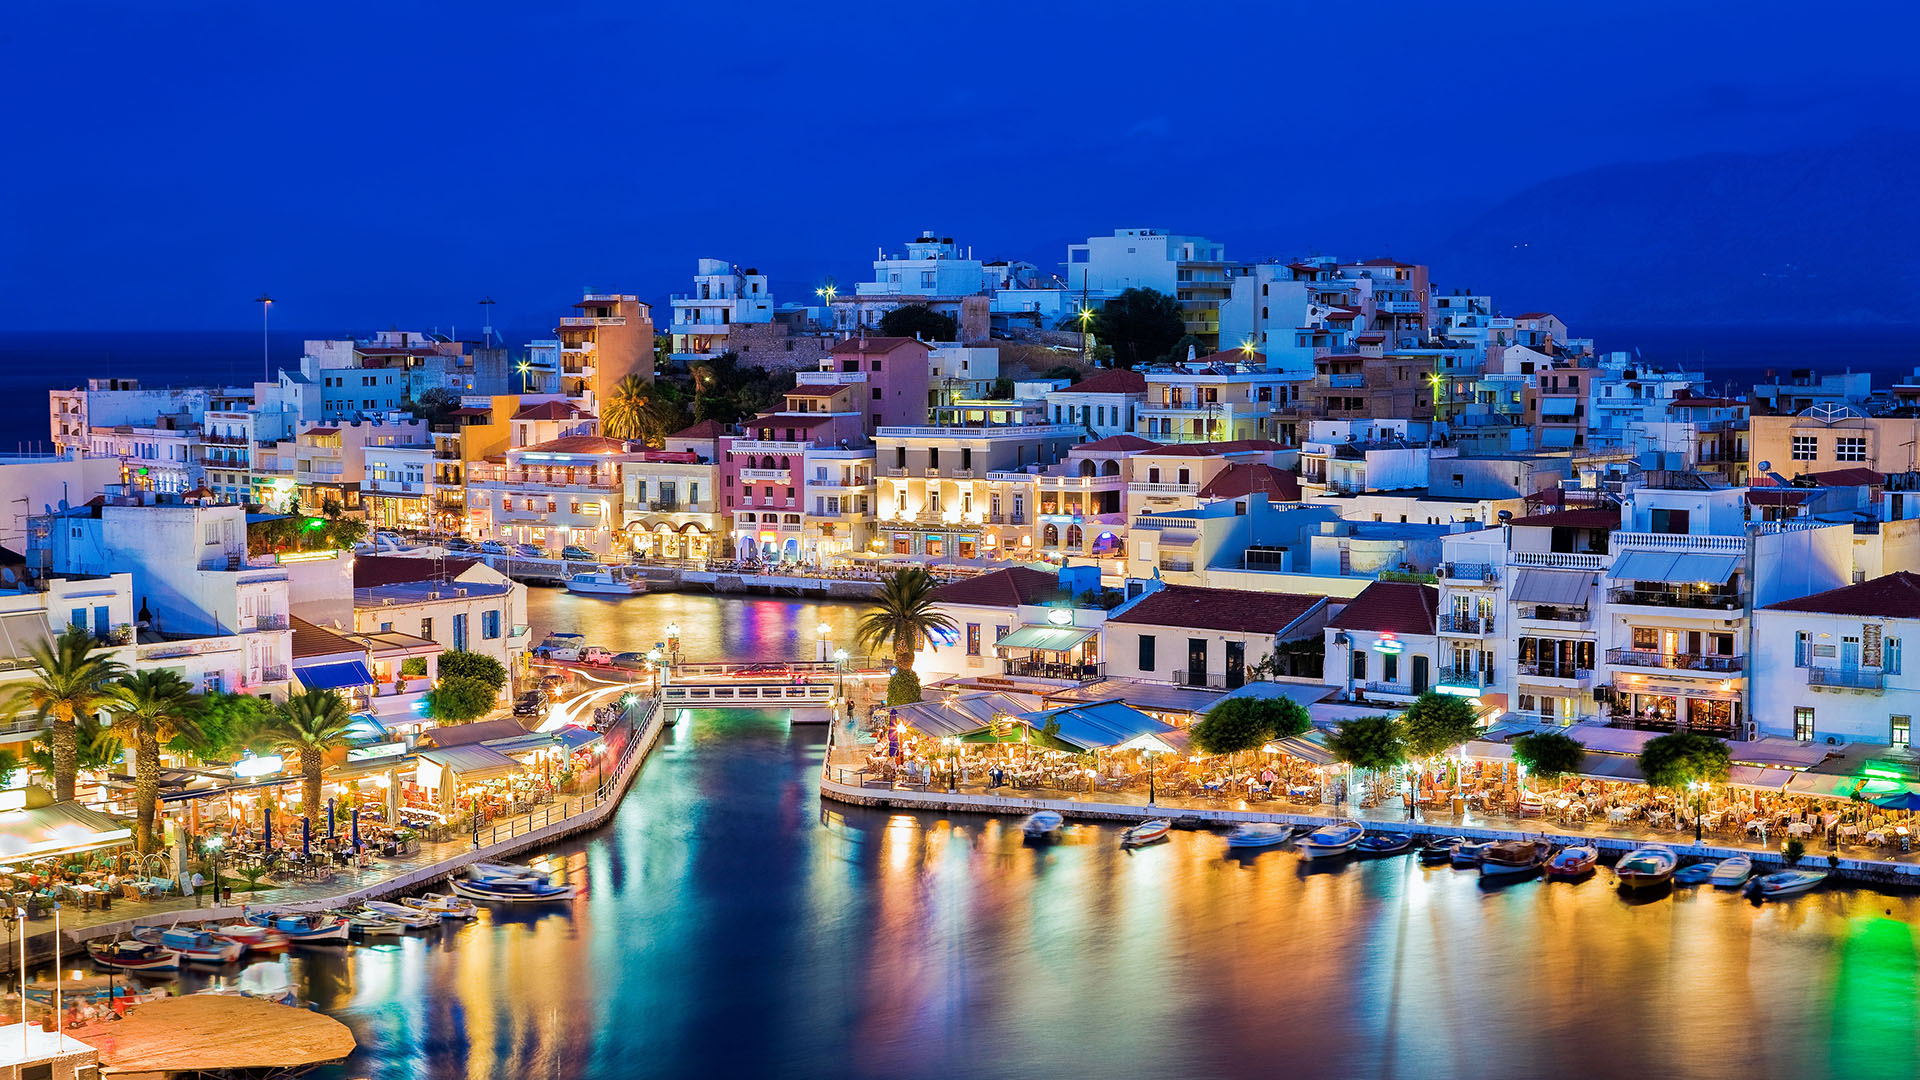 Agios-Nikolaos-Crete-1920x1080-Need-iPhone-S-Plus-Background-for-IPhoneSPlus-F-wallpaper-wp3602283